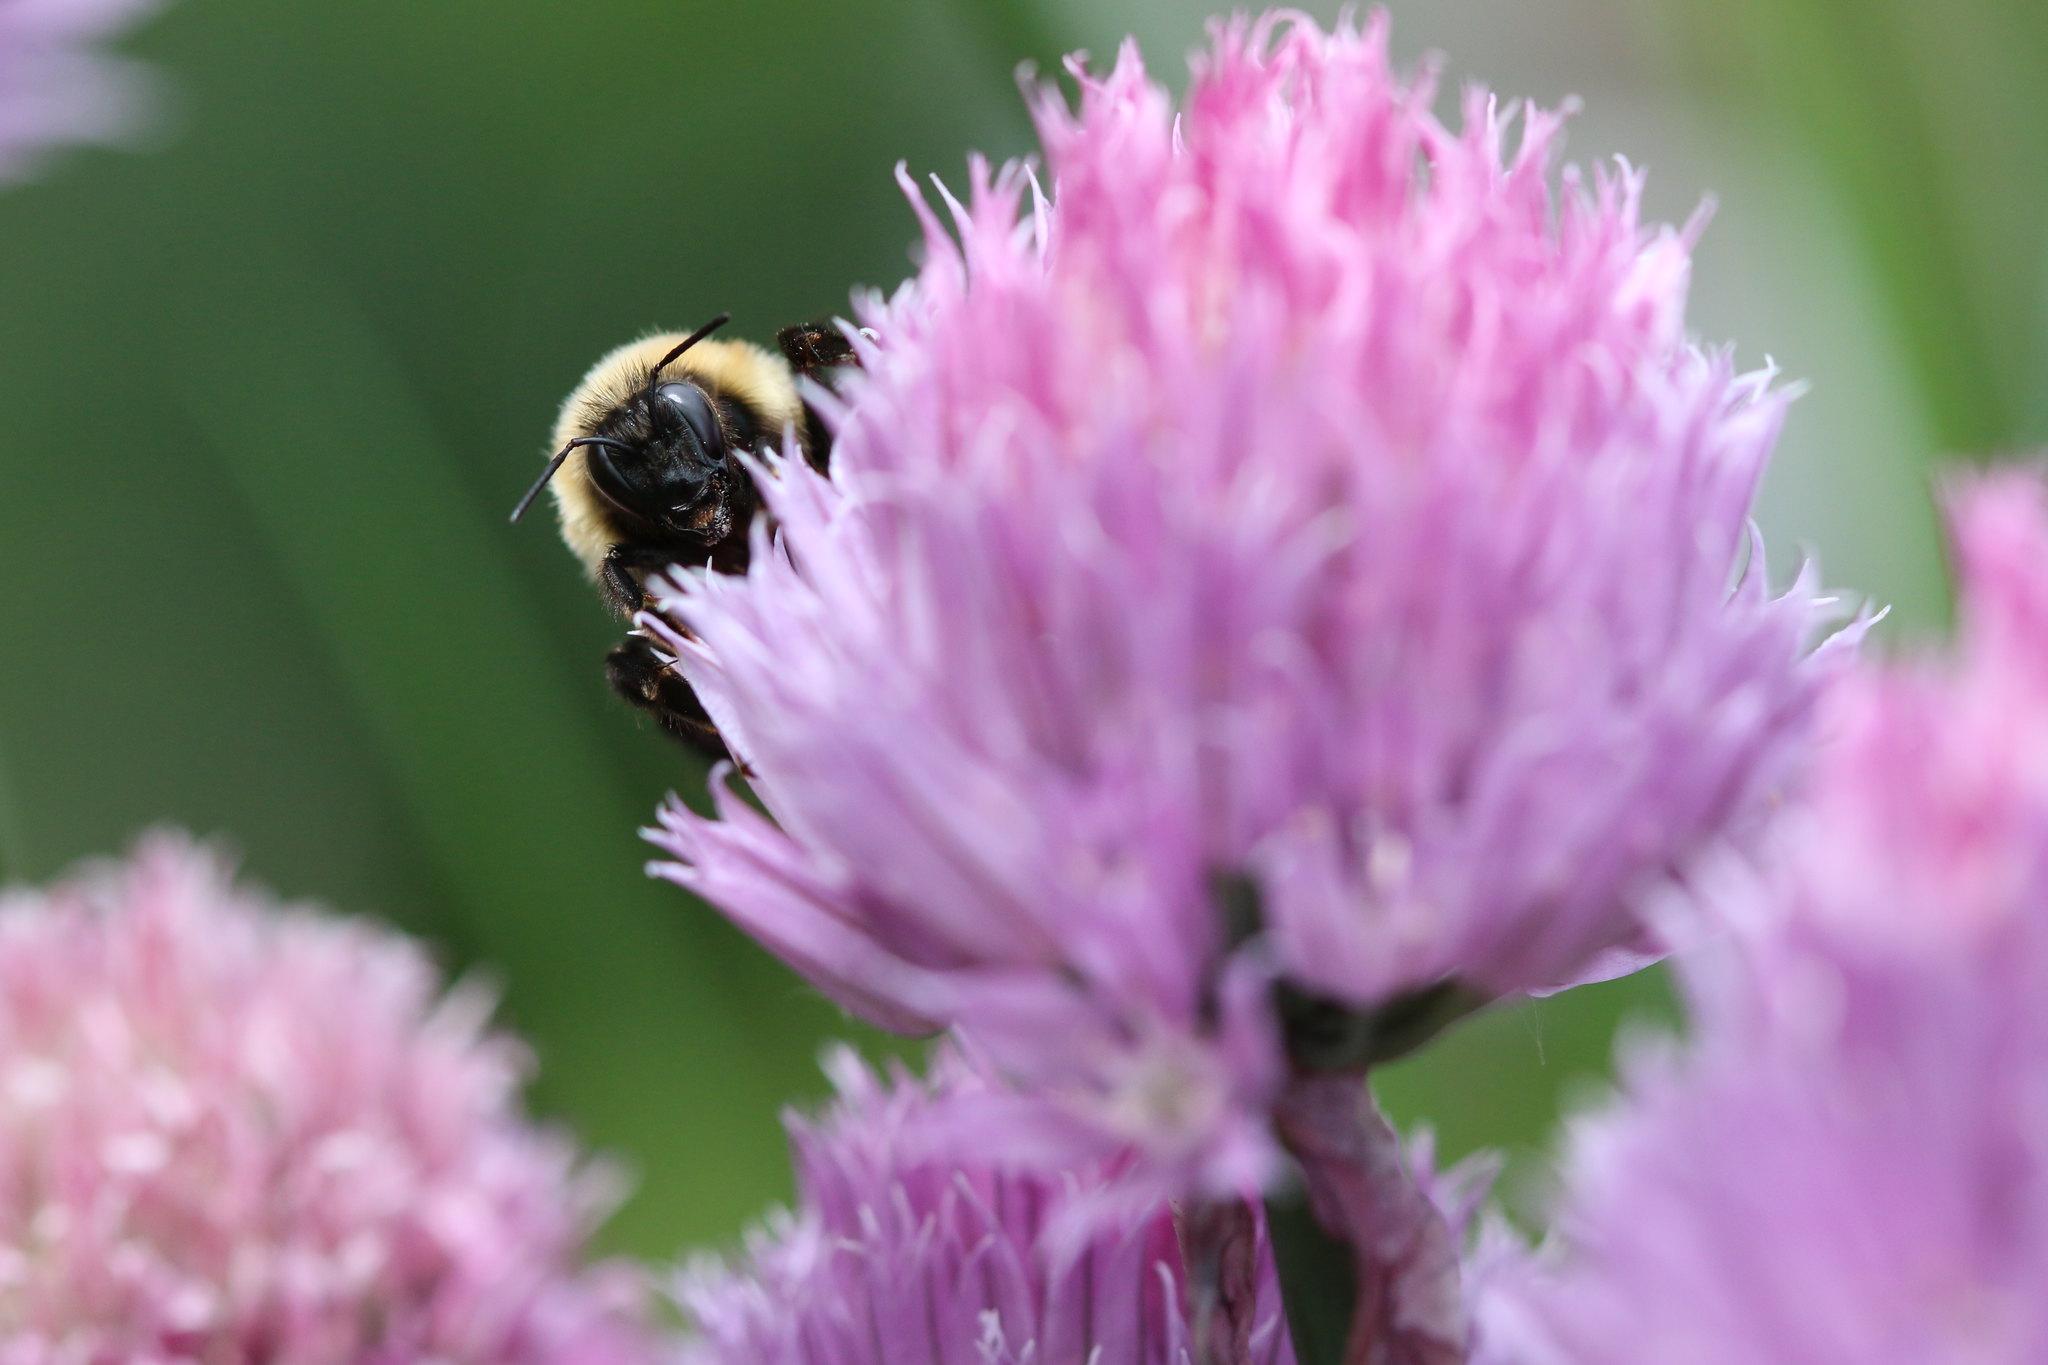 What's Buzzing? (SOTC 361/365)